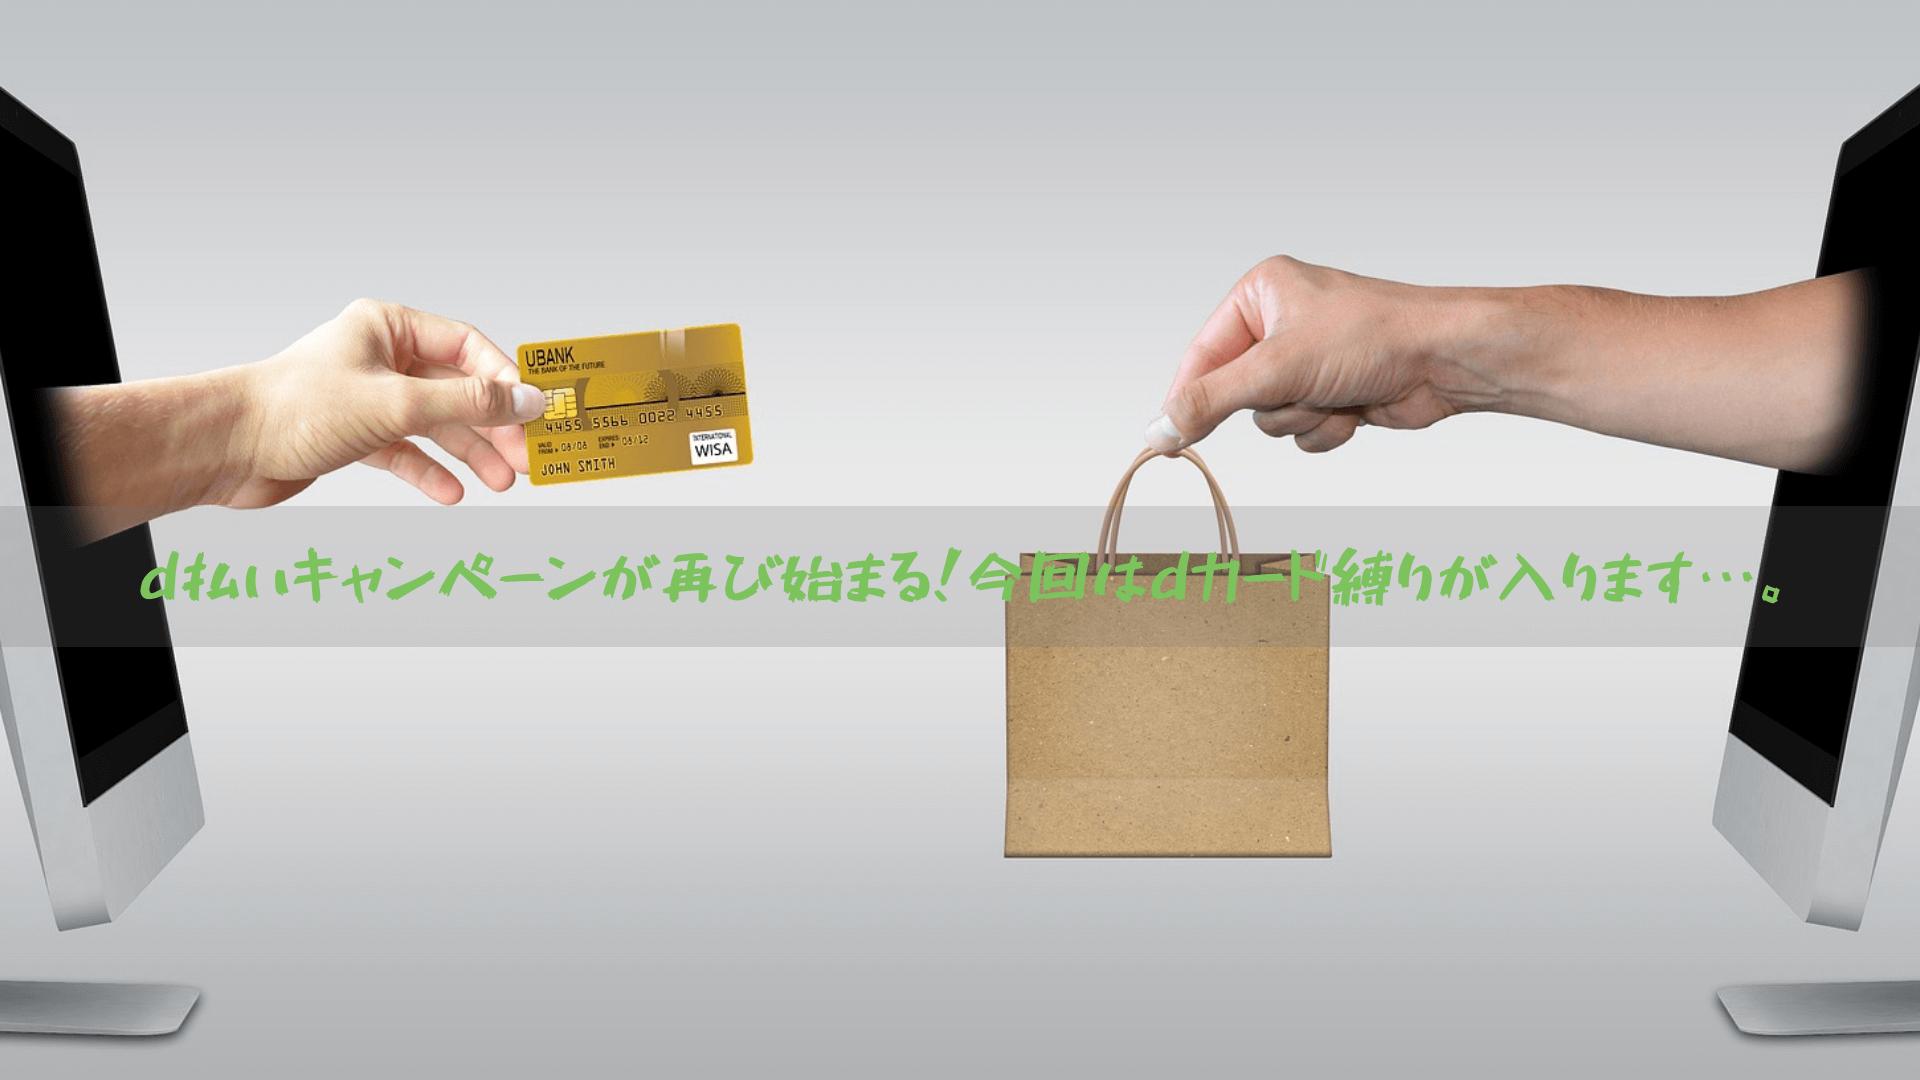 d払いキャンペーンが再び始まる!今回はdカード縛りが入ります…。